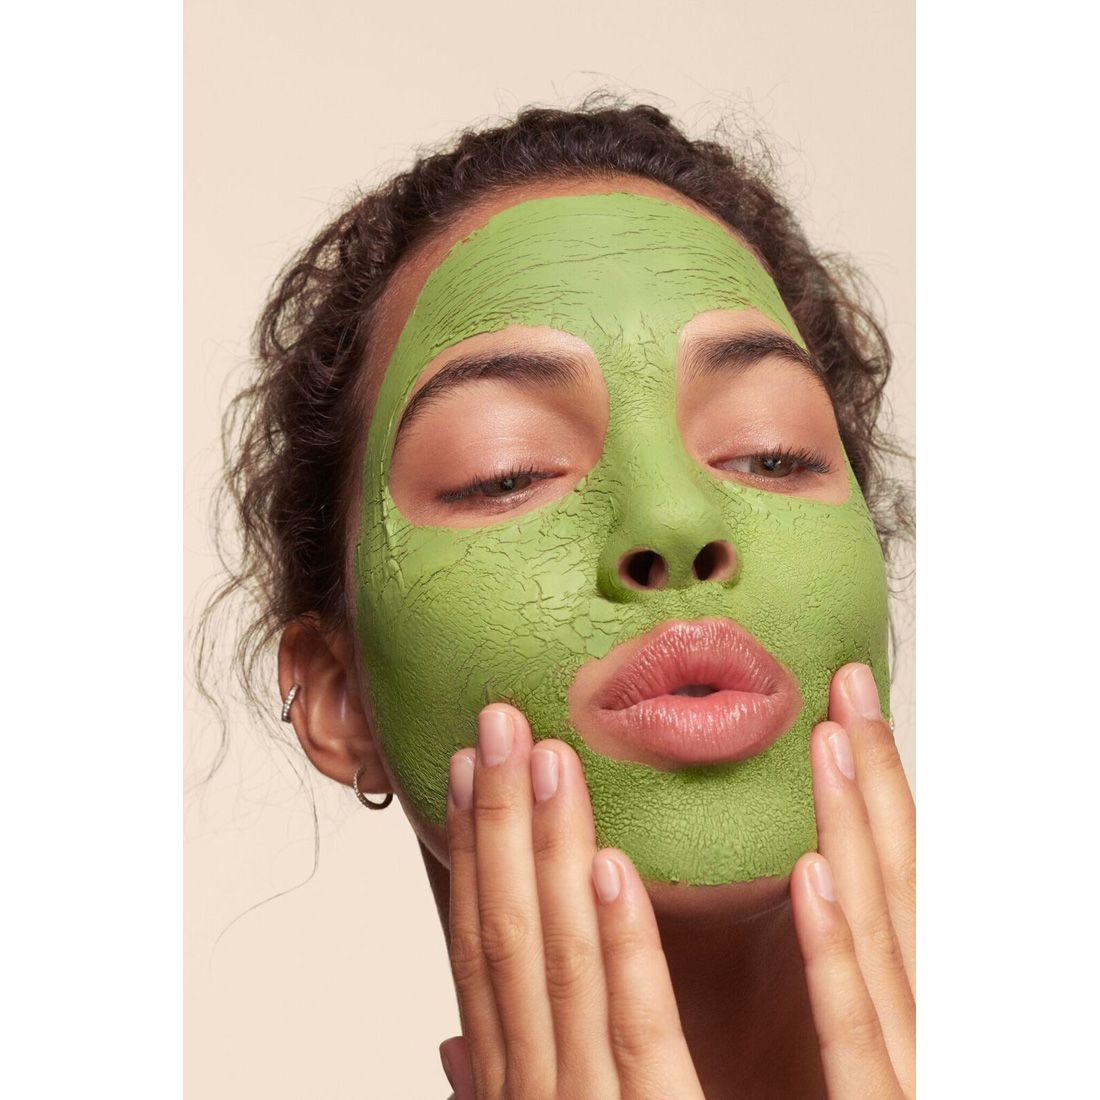 MATCHA Magic SuperAntioxidant Mask Cruelty free beauty